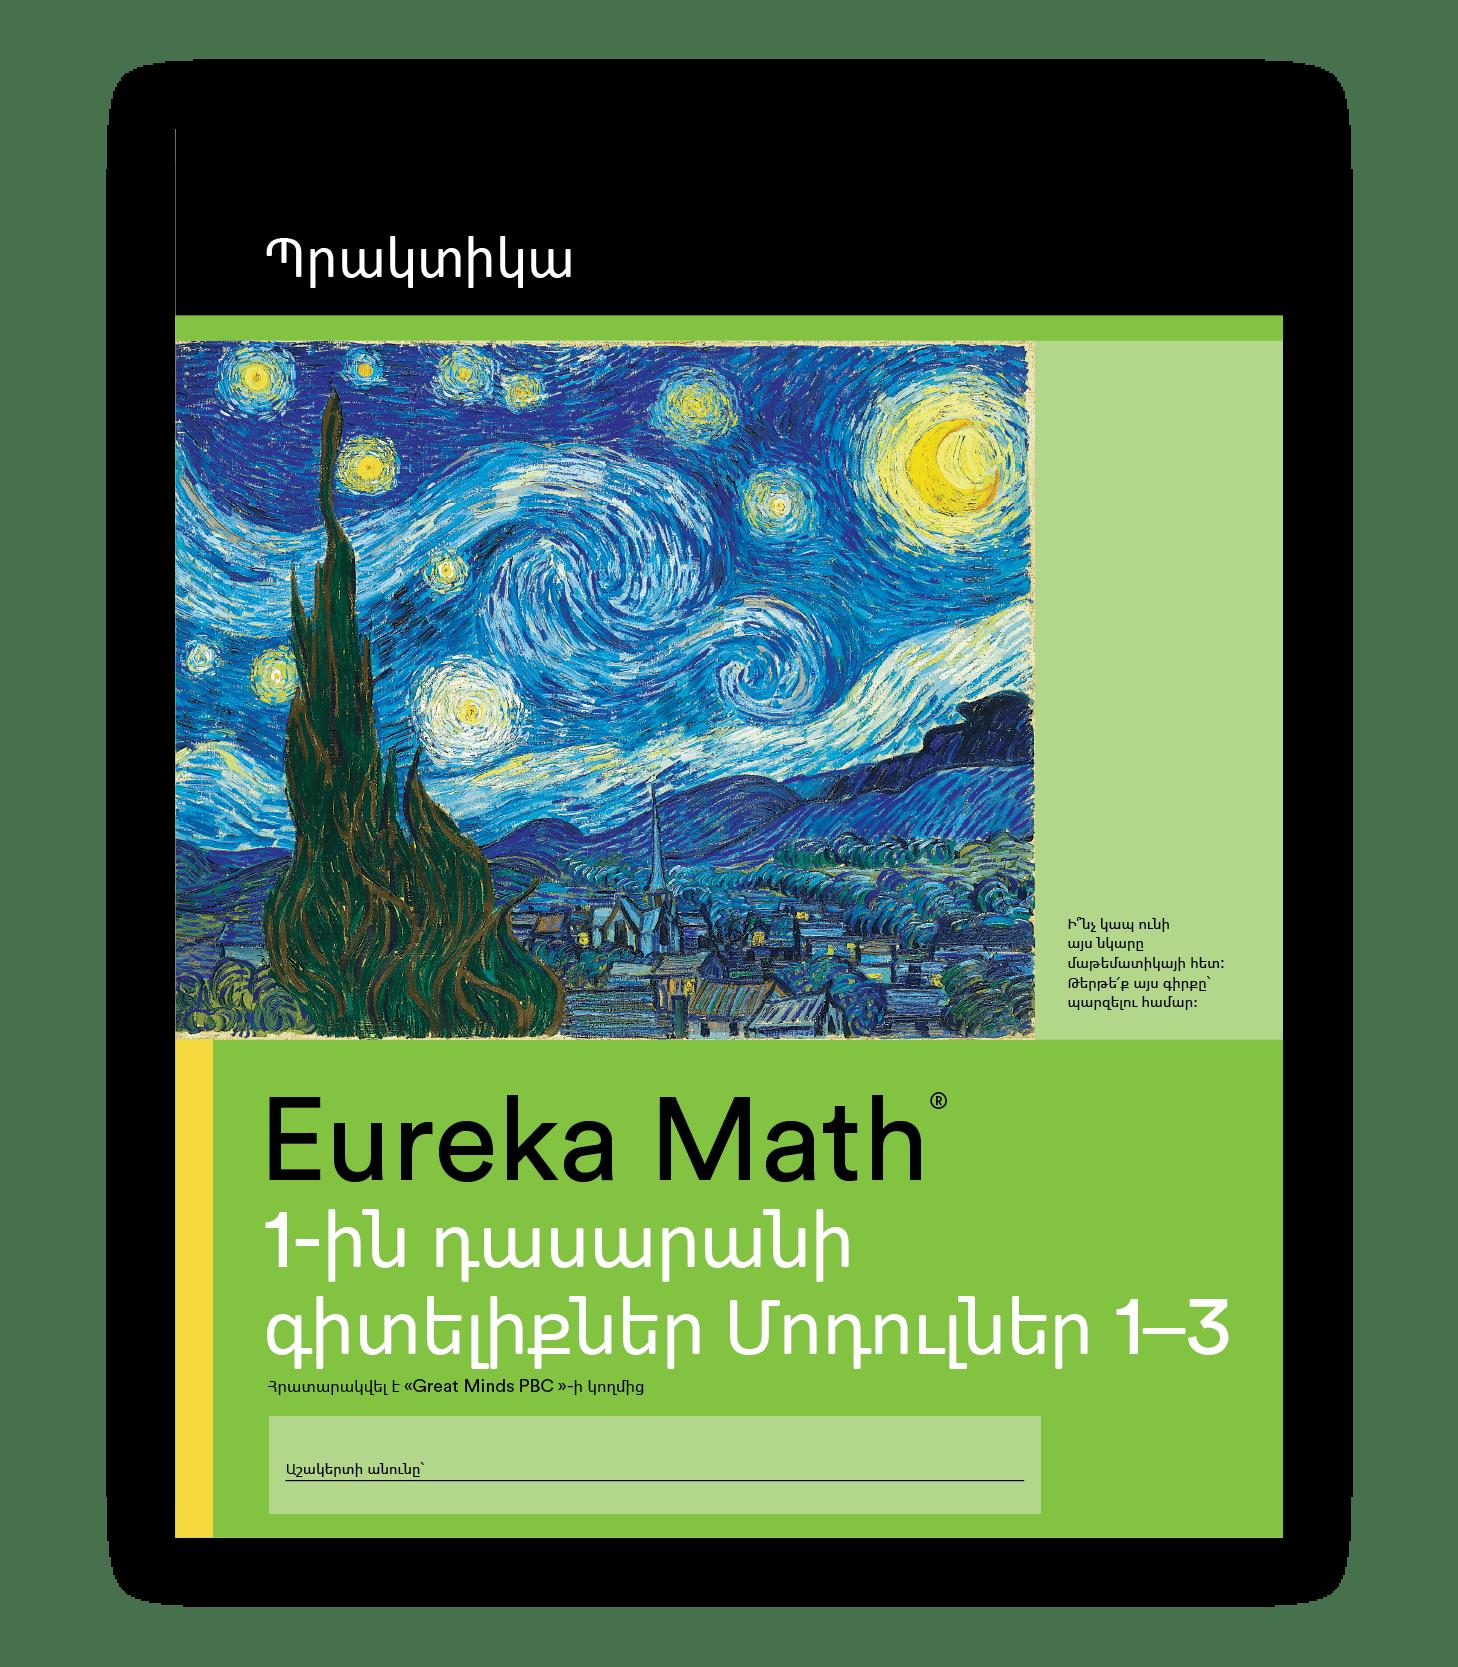 Eureka Math Practice Book in Armenian for Grade 1